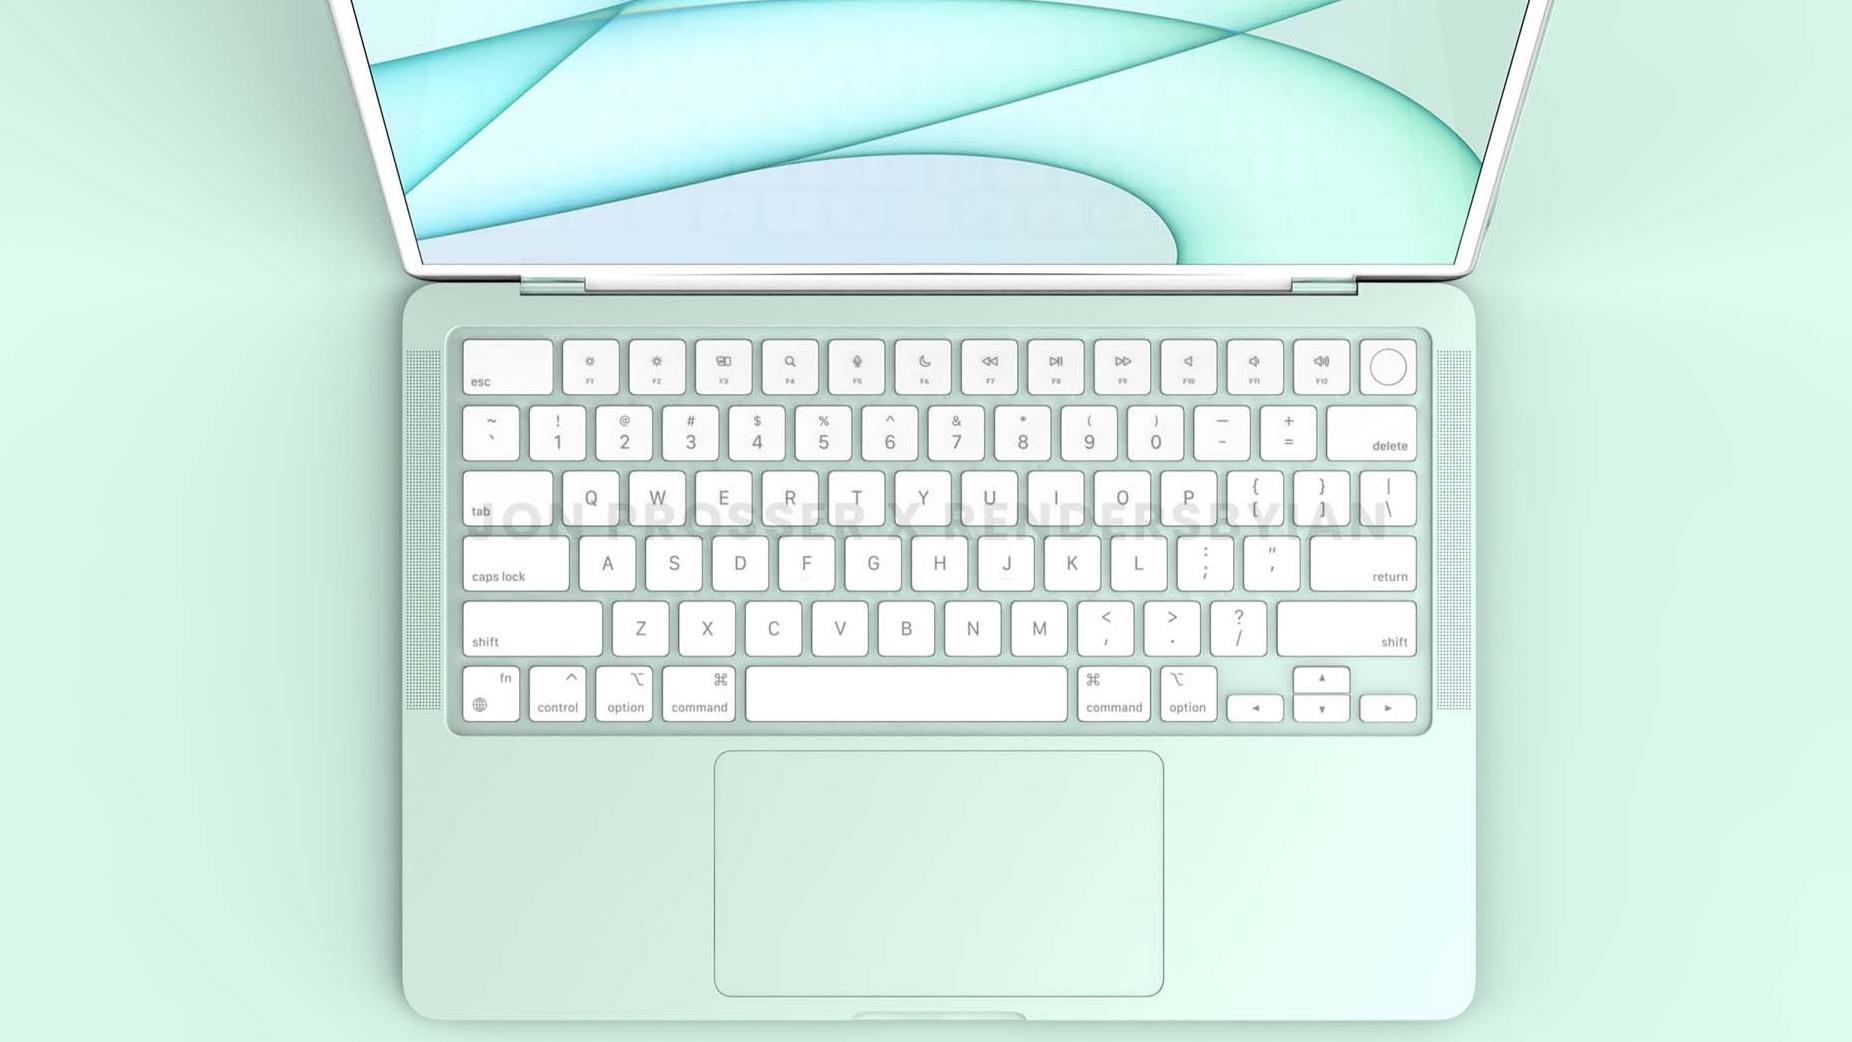 MacBook Air 2022 release date veel later